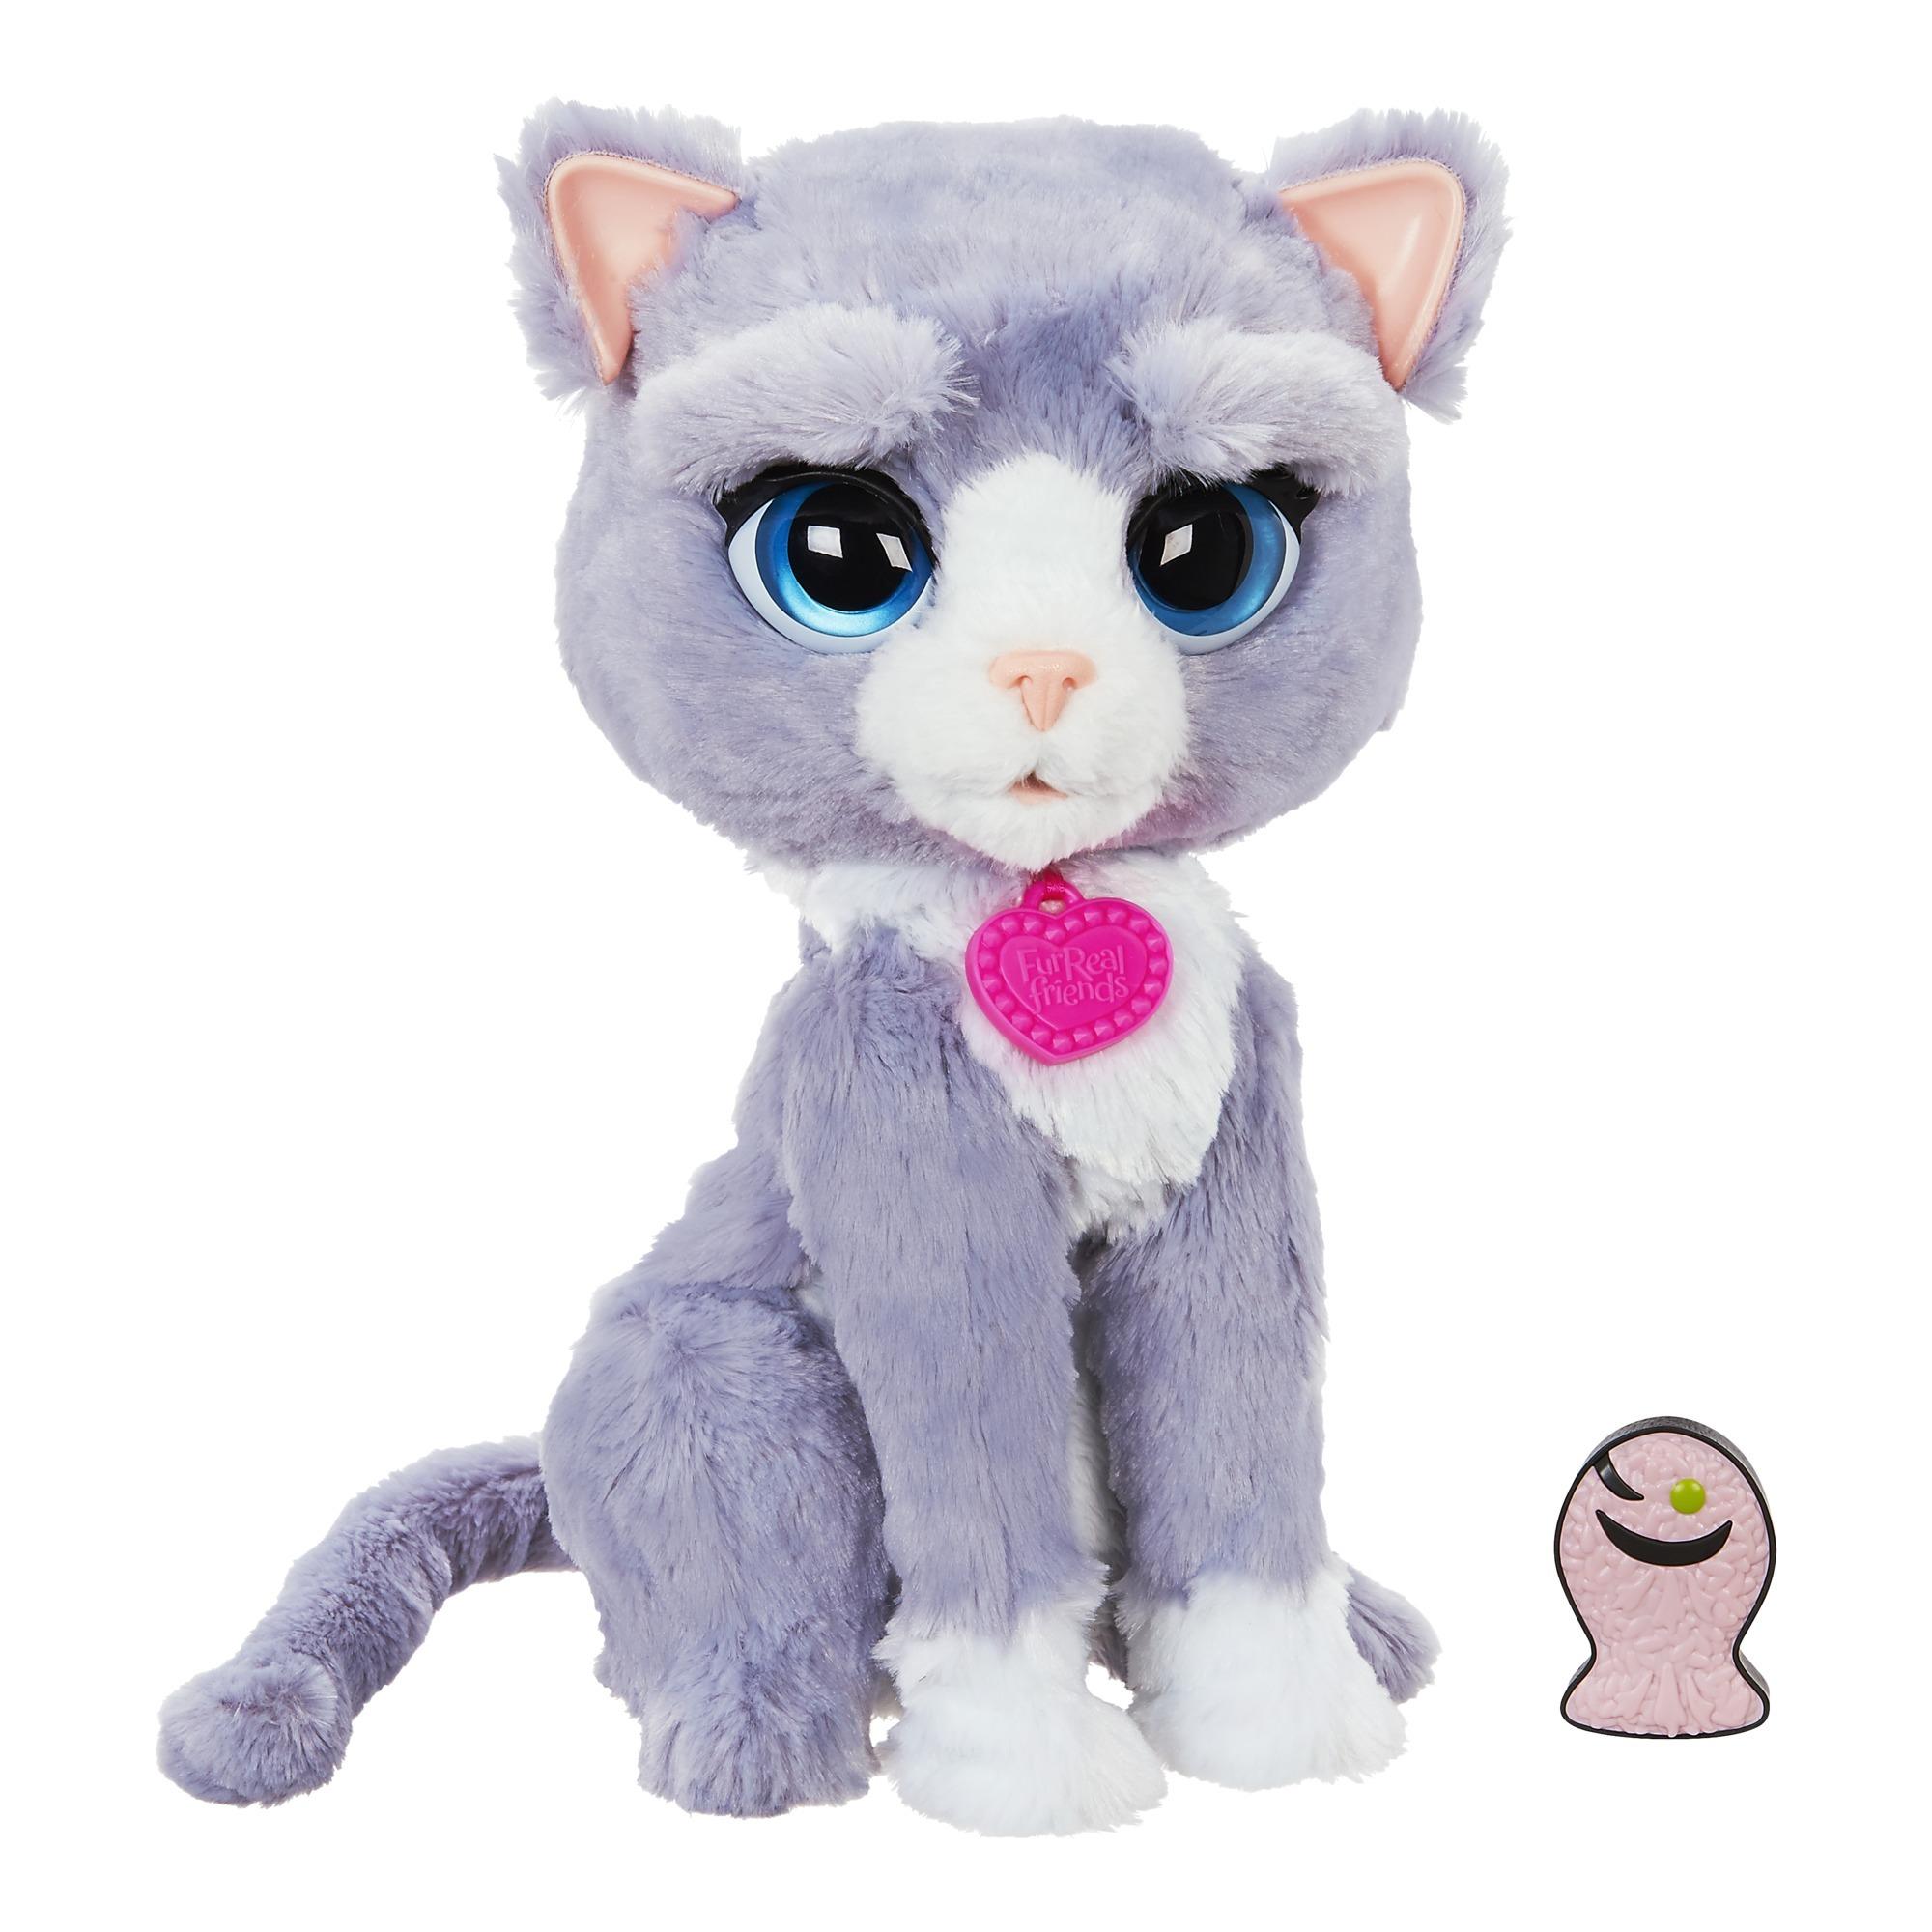 B5936EU4 Jouet chat Gris jouet en peluche